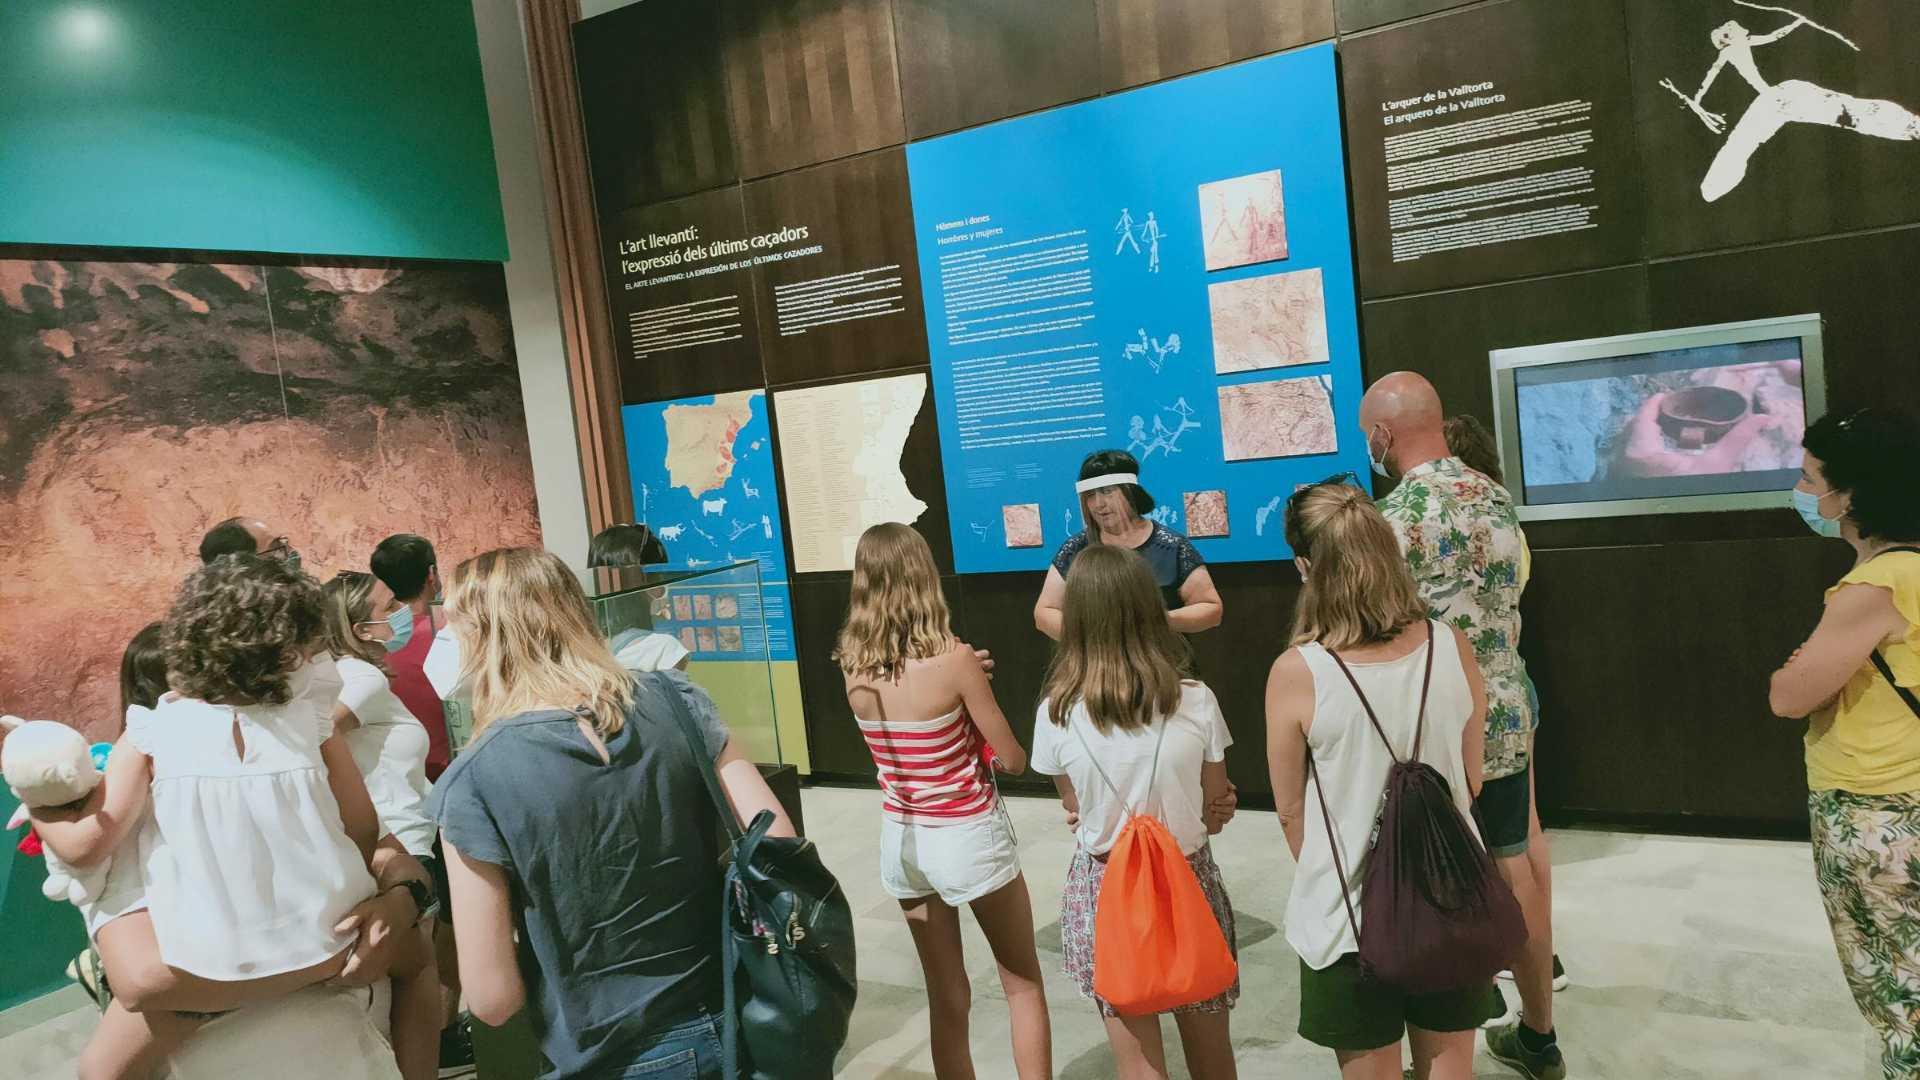 Visita guiada Museu de la Valltorta